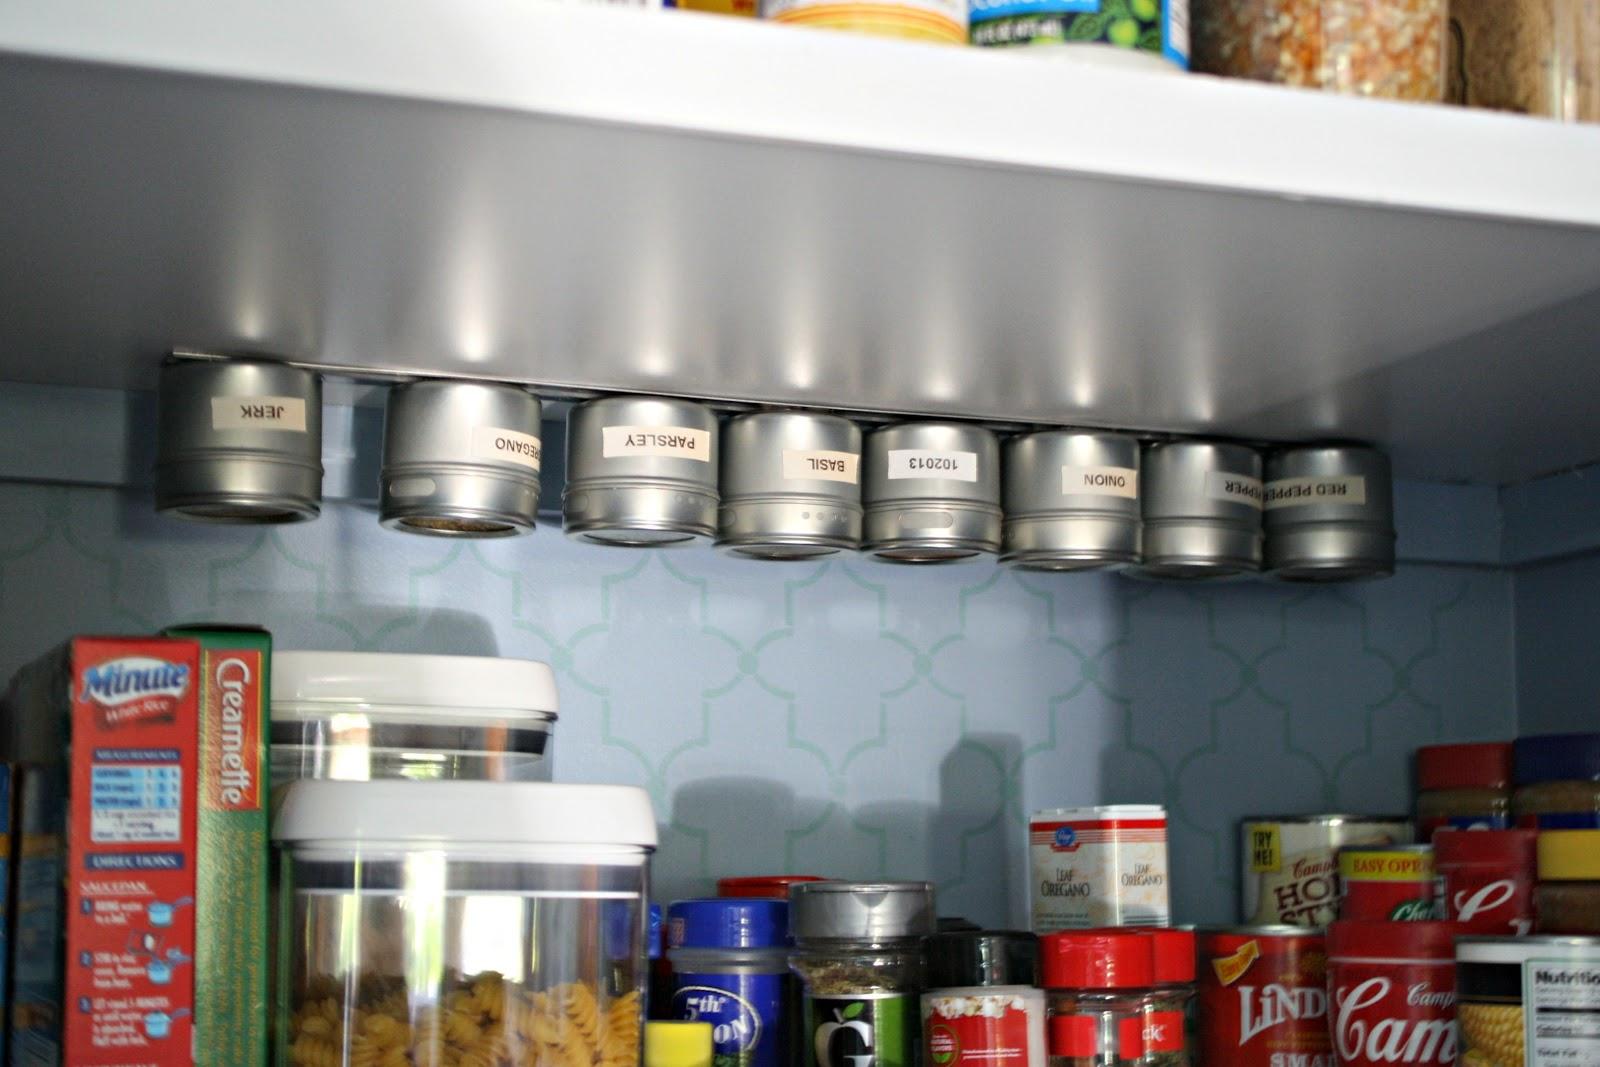 Gaining Kitchen Storage from Thrifty Decor Chick